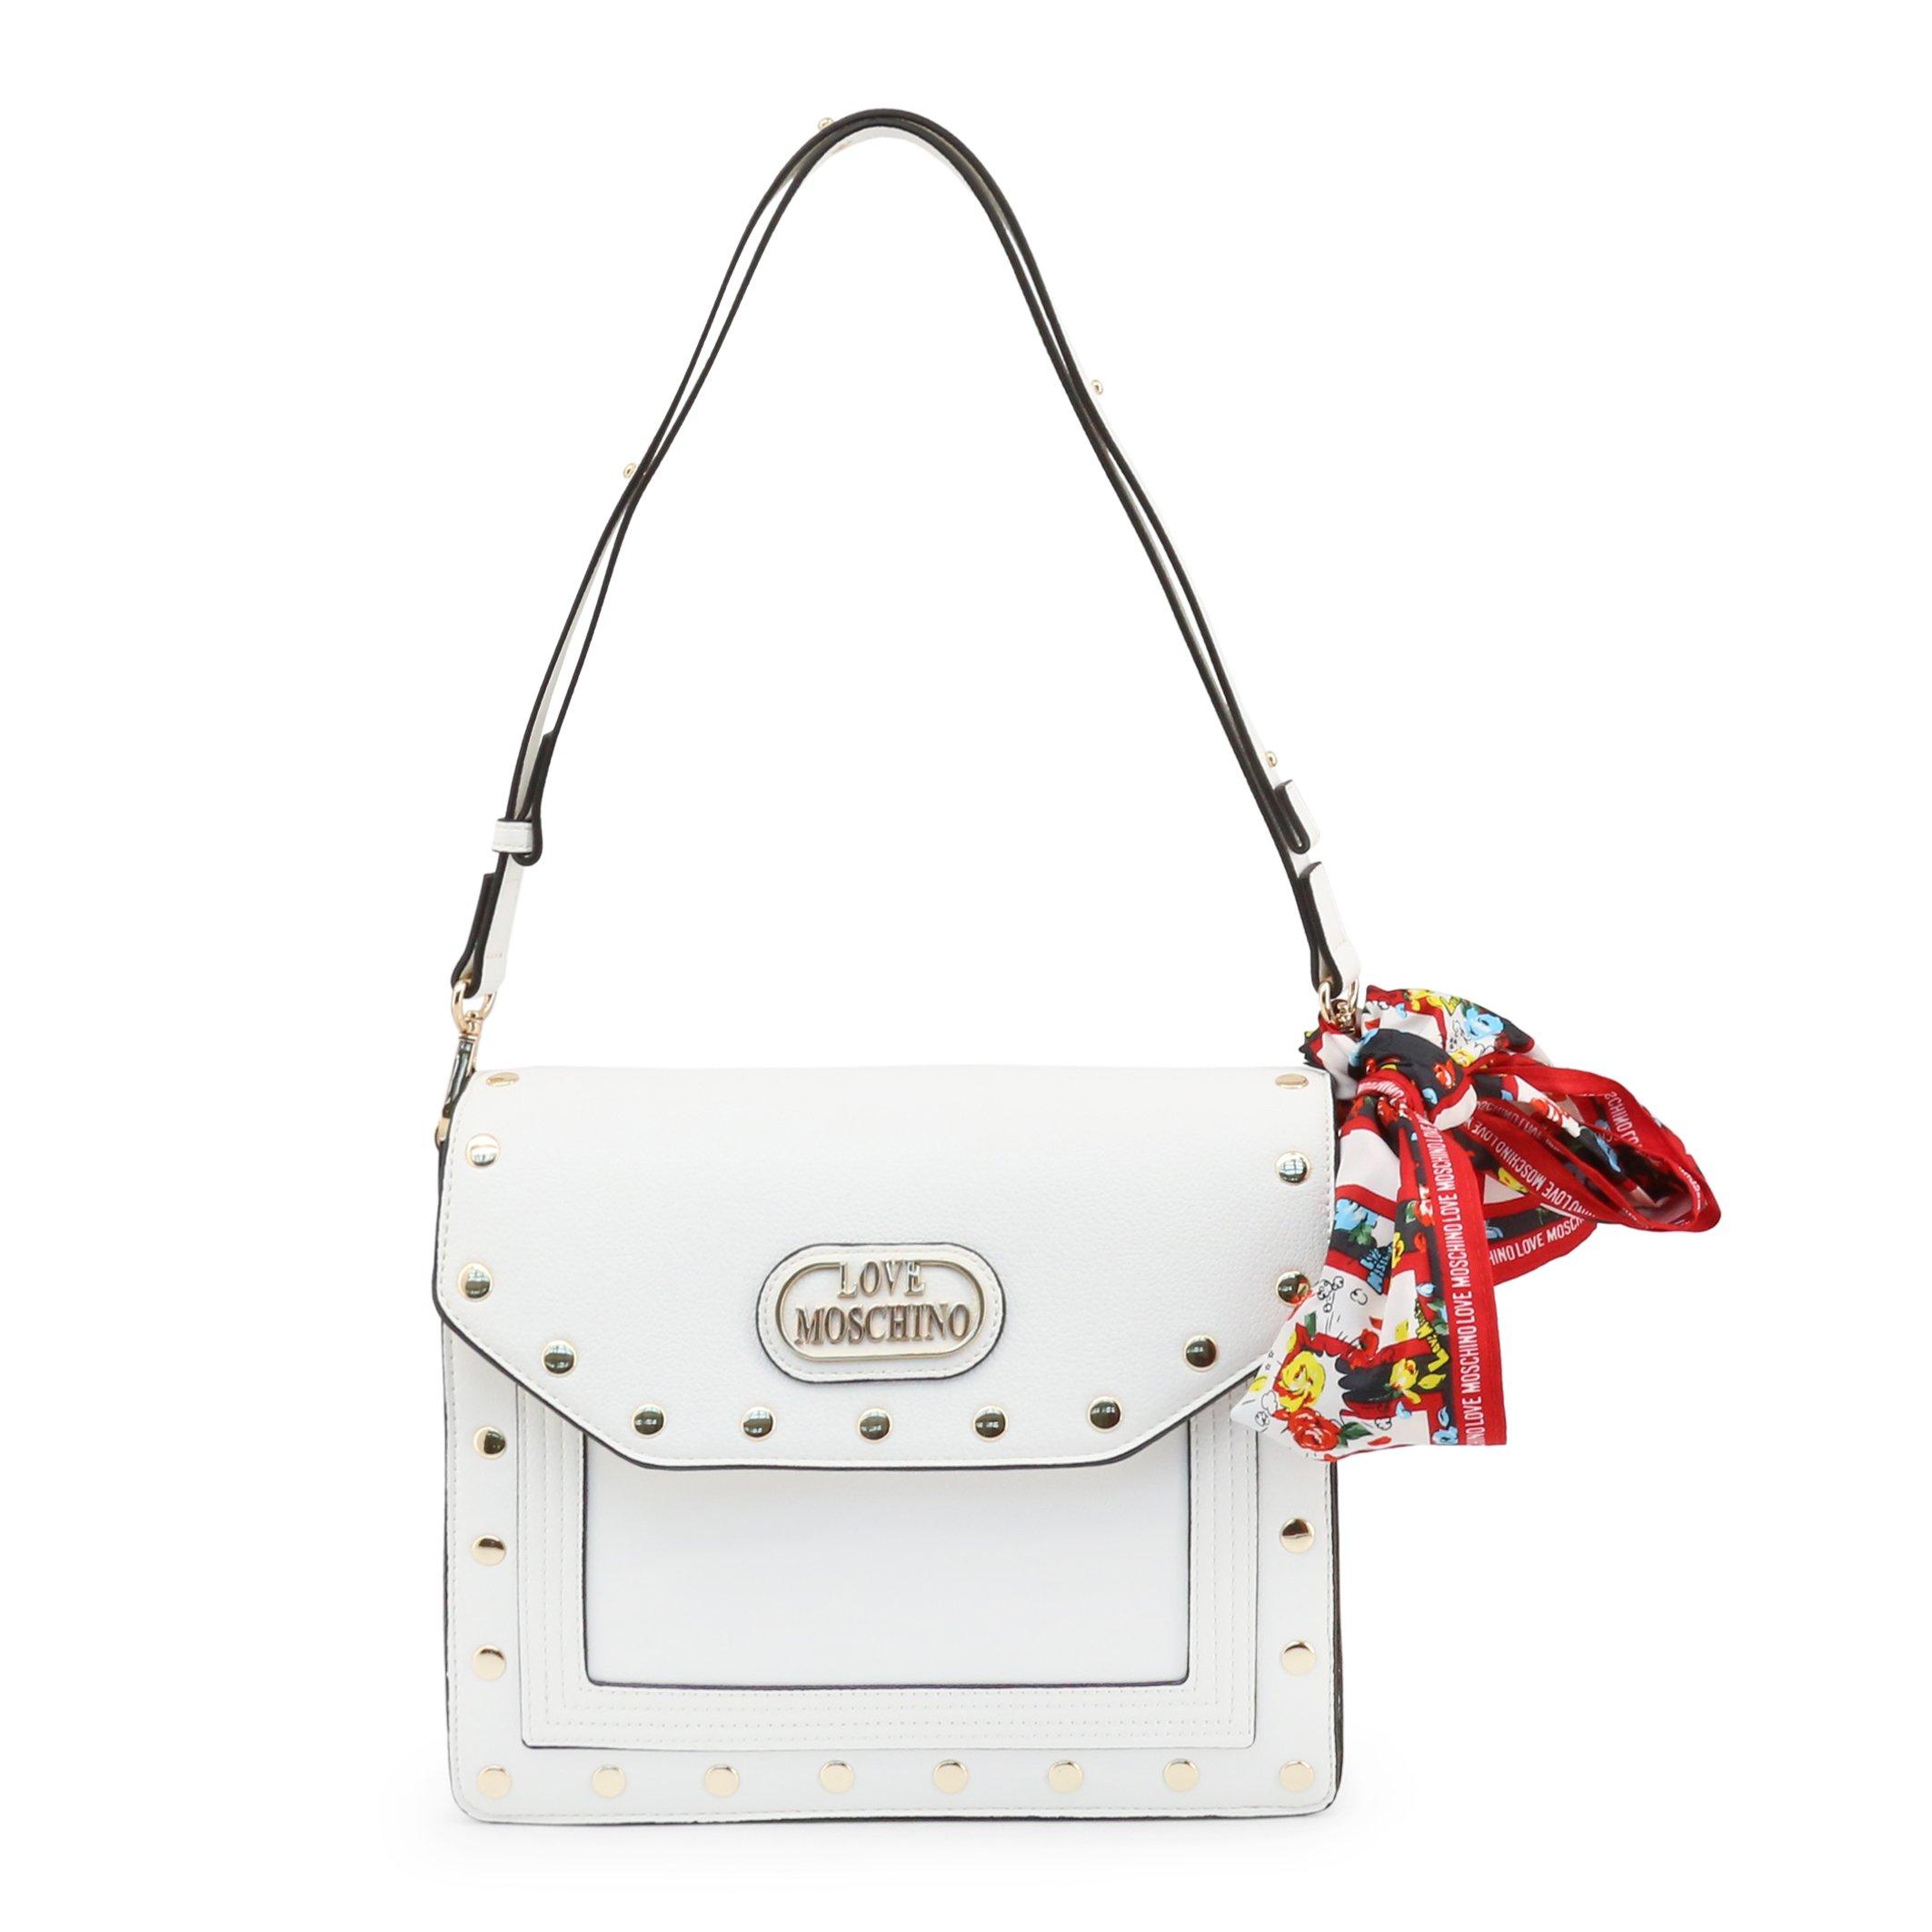 Love Moschino Women's Shoulder Bag Black JC4043PP1CLE1 - white NOSIZE